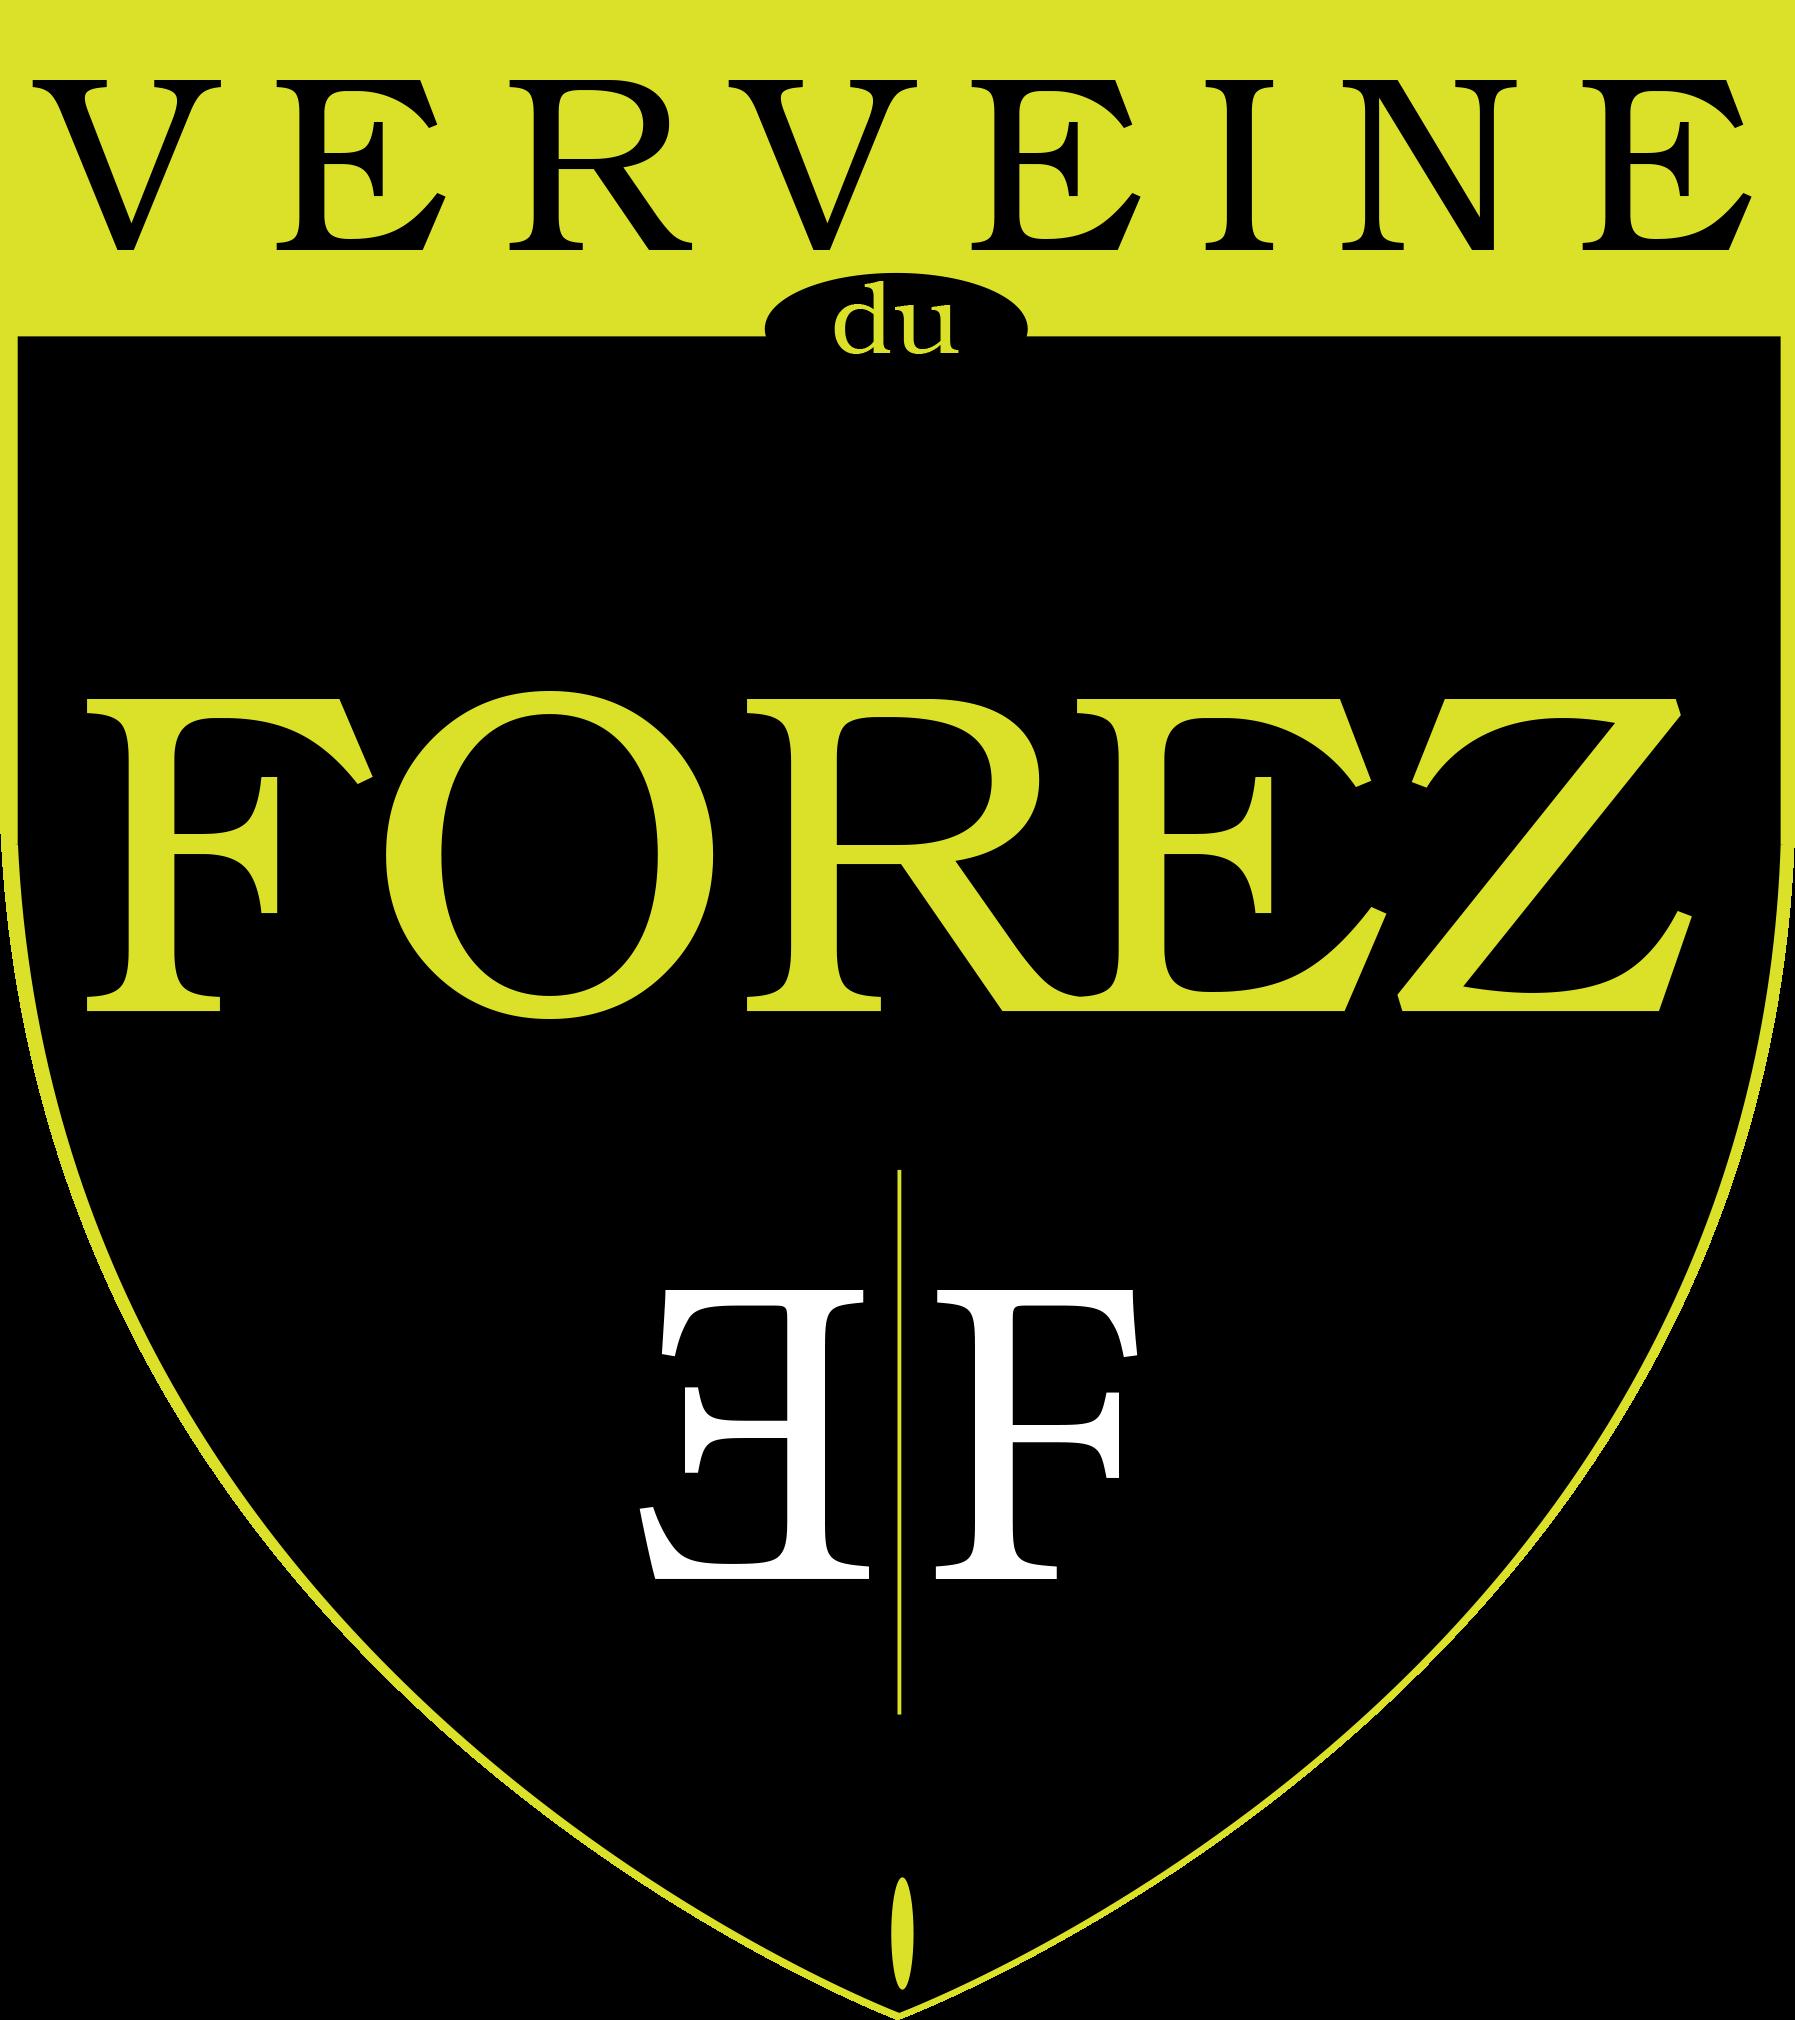 Logo Verveine du Forez